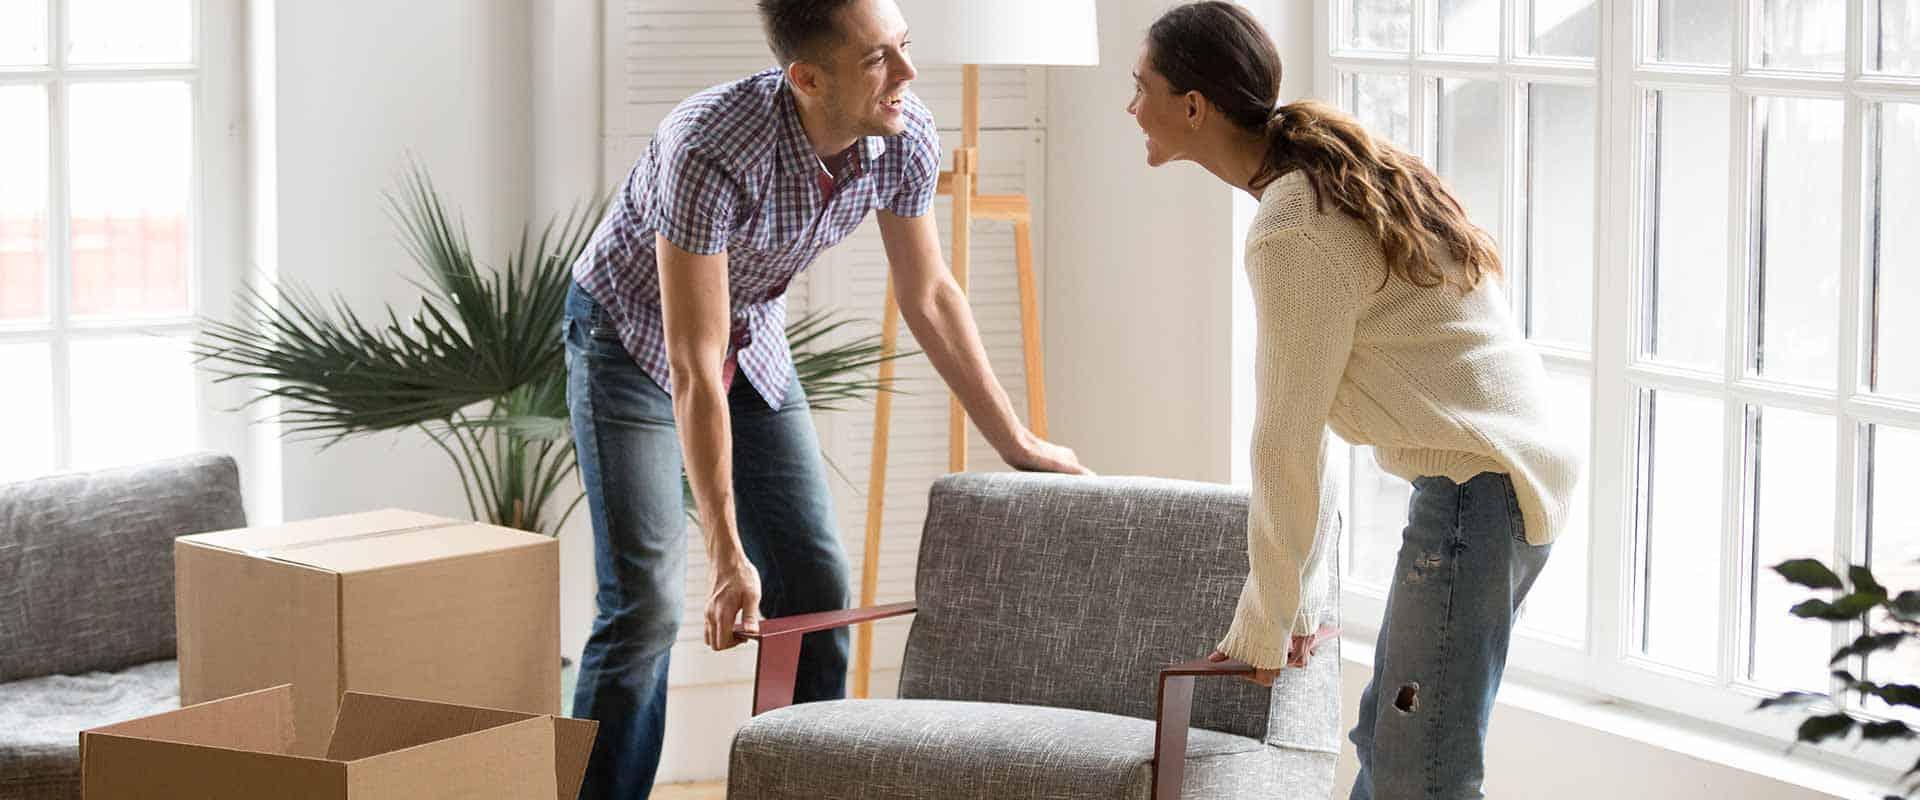 Greystone Properties Columbus GA apartments will save you money on home furnishings